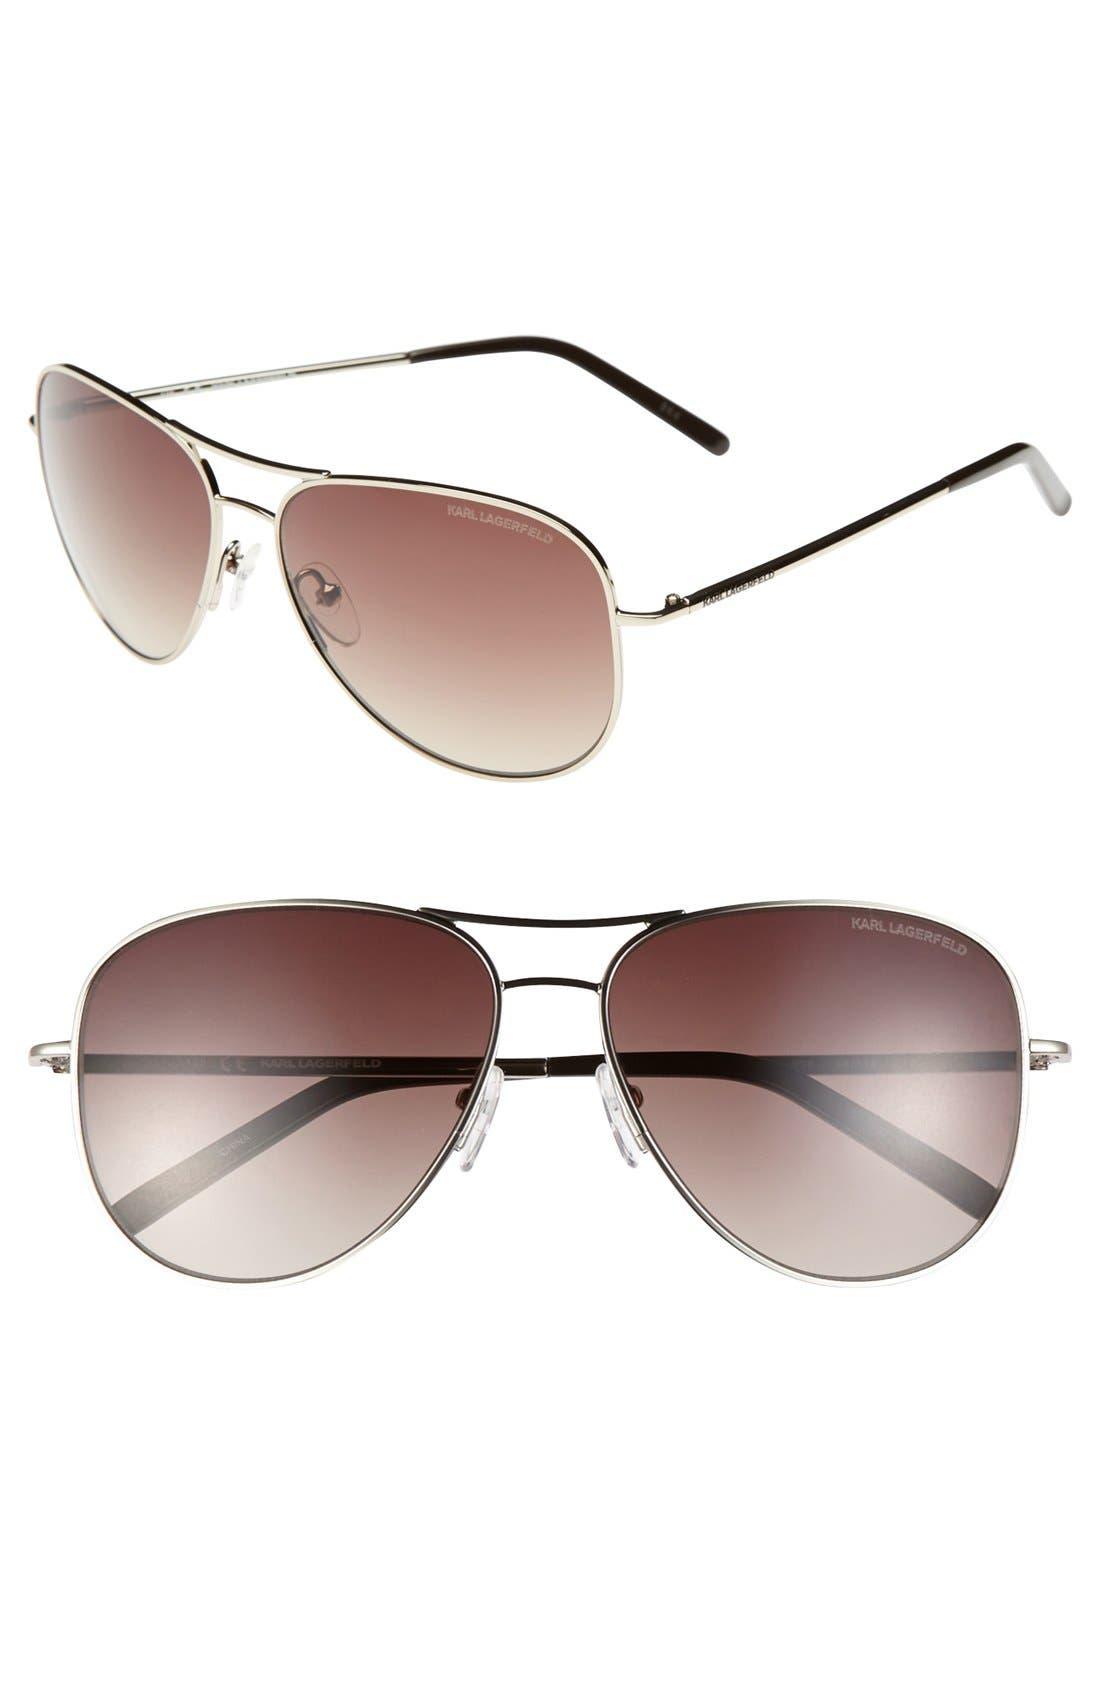 Alternate Image 1 Selected - Karl Lagerfeld 58mm Metal Aviator Sunglasses